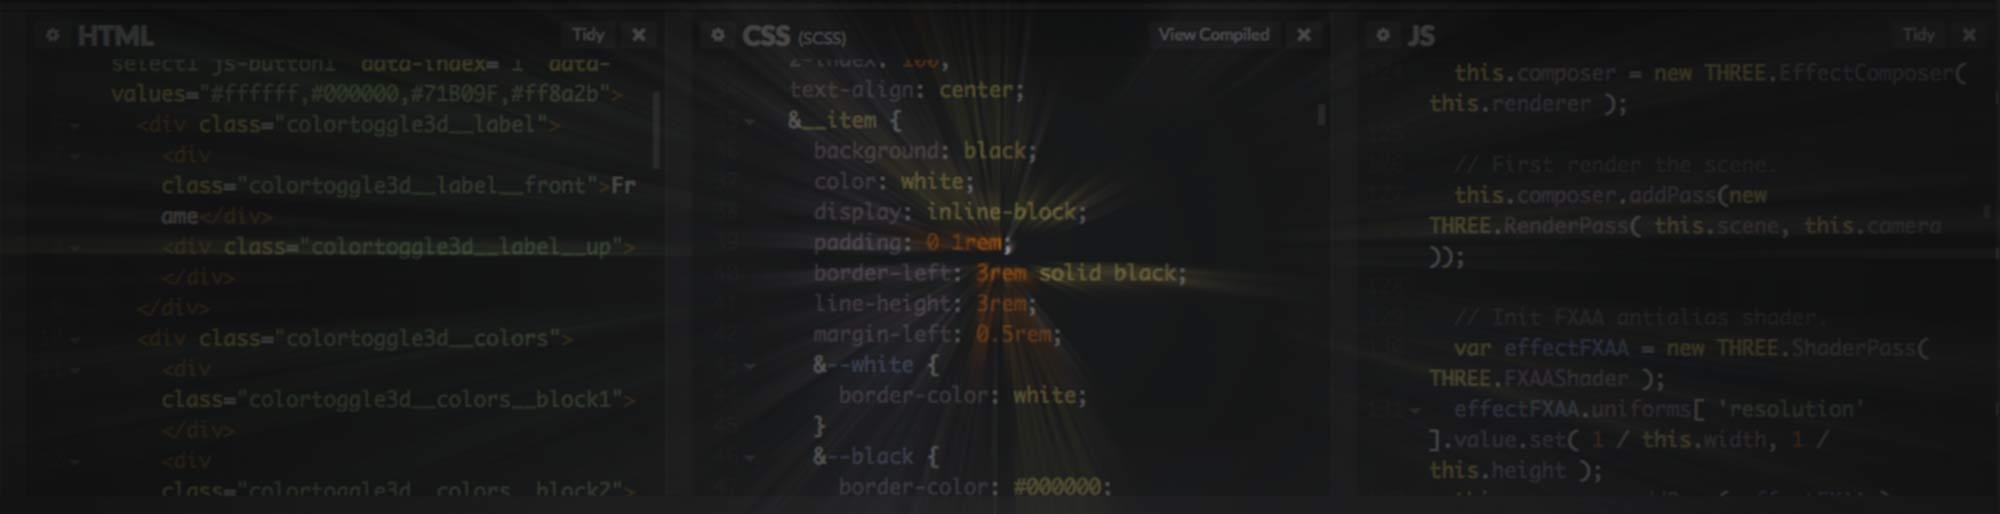 Codepen is like Instagram for developers - Evermade fi